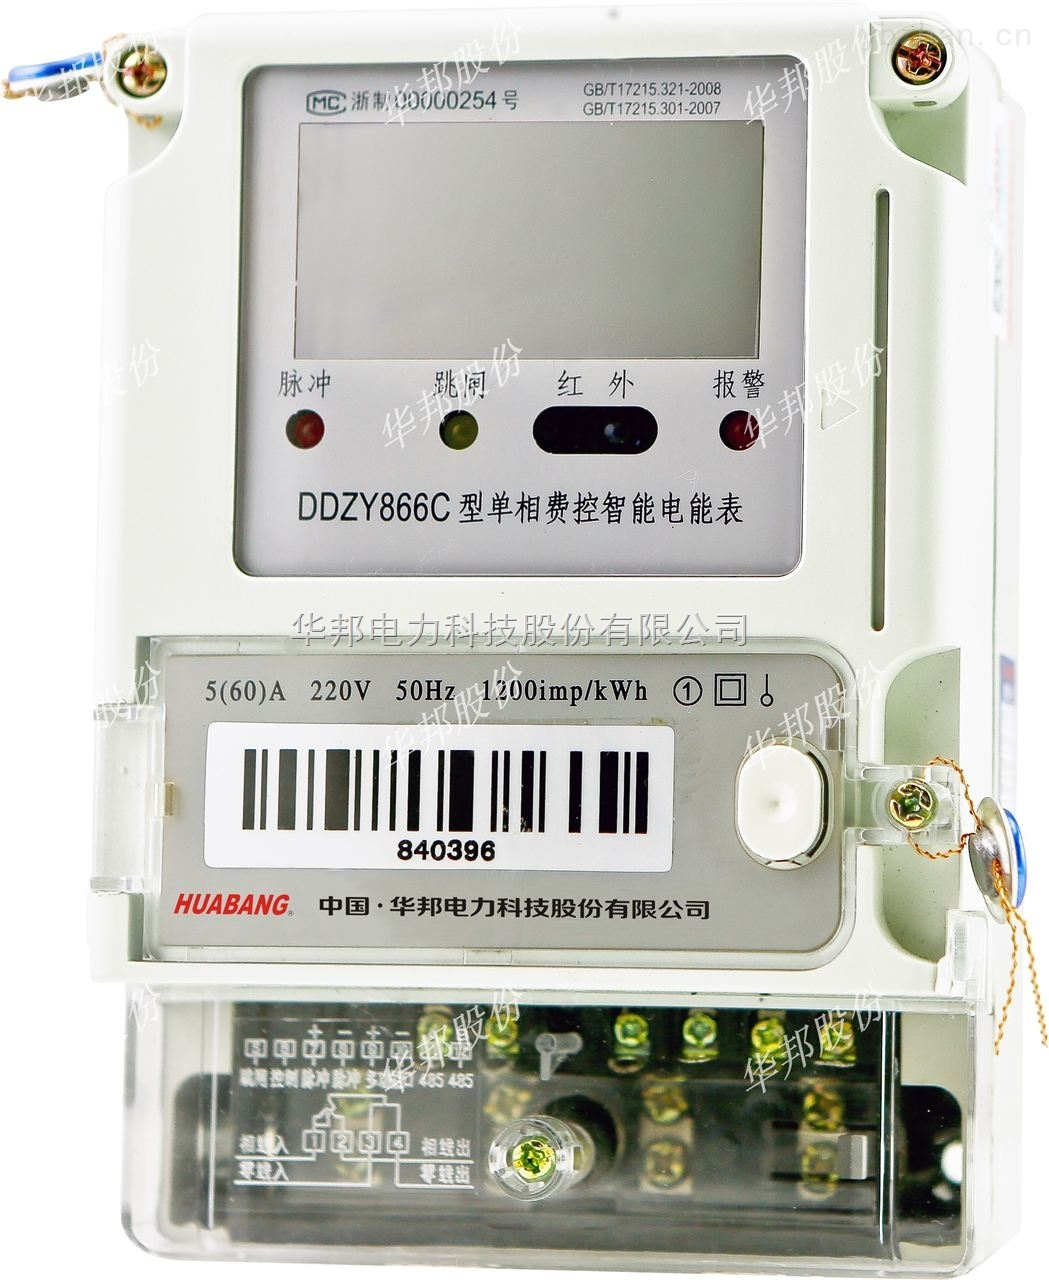 ddzy866c-z 河北智能费控电表批发价格